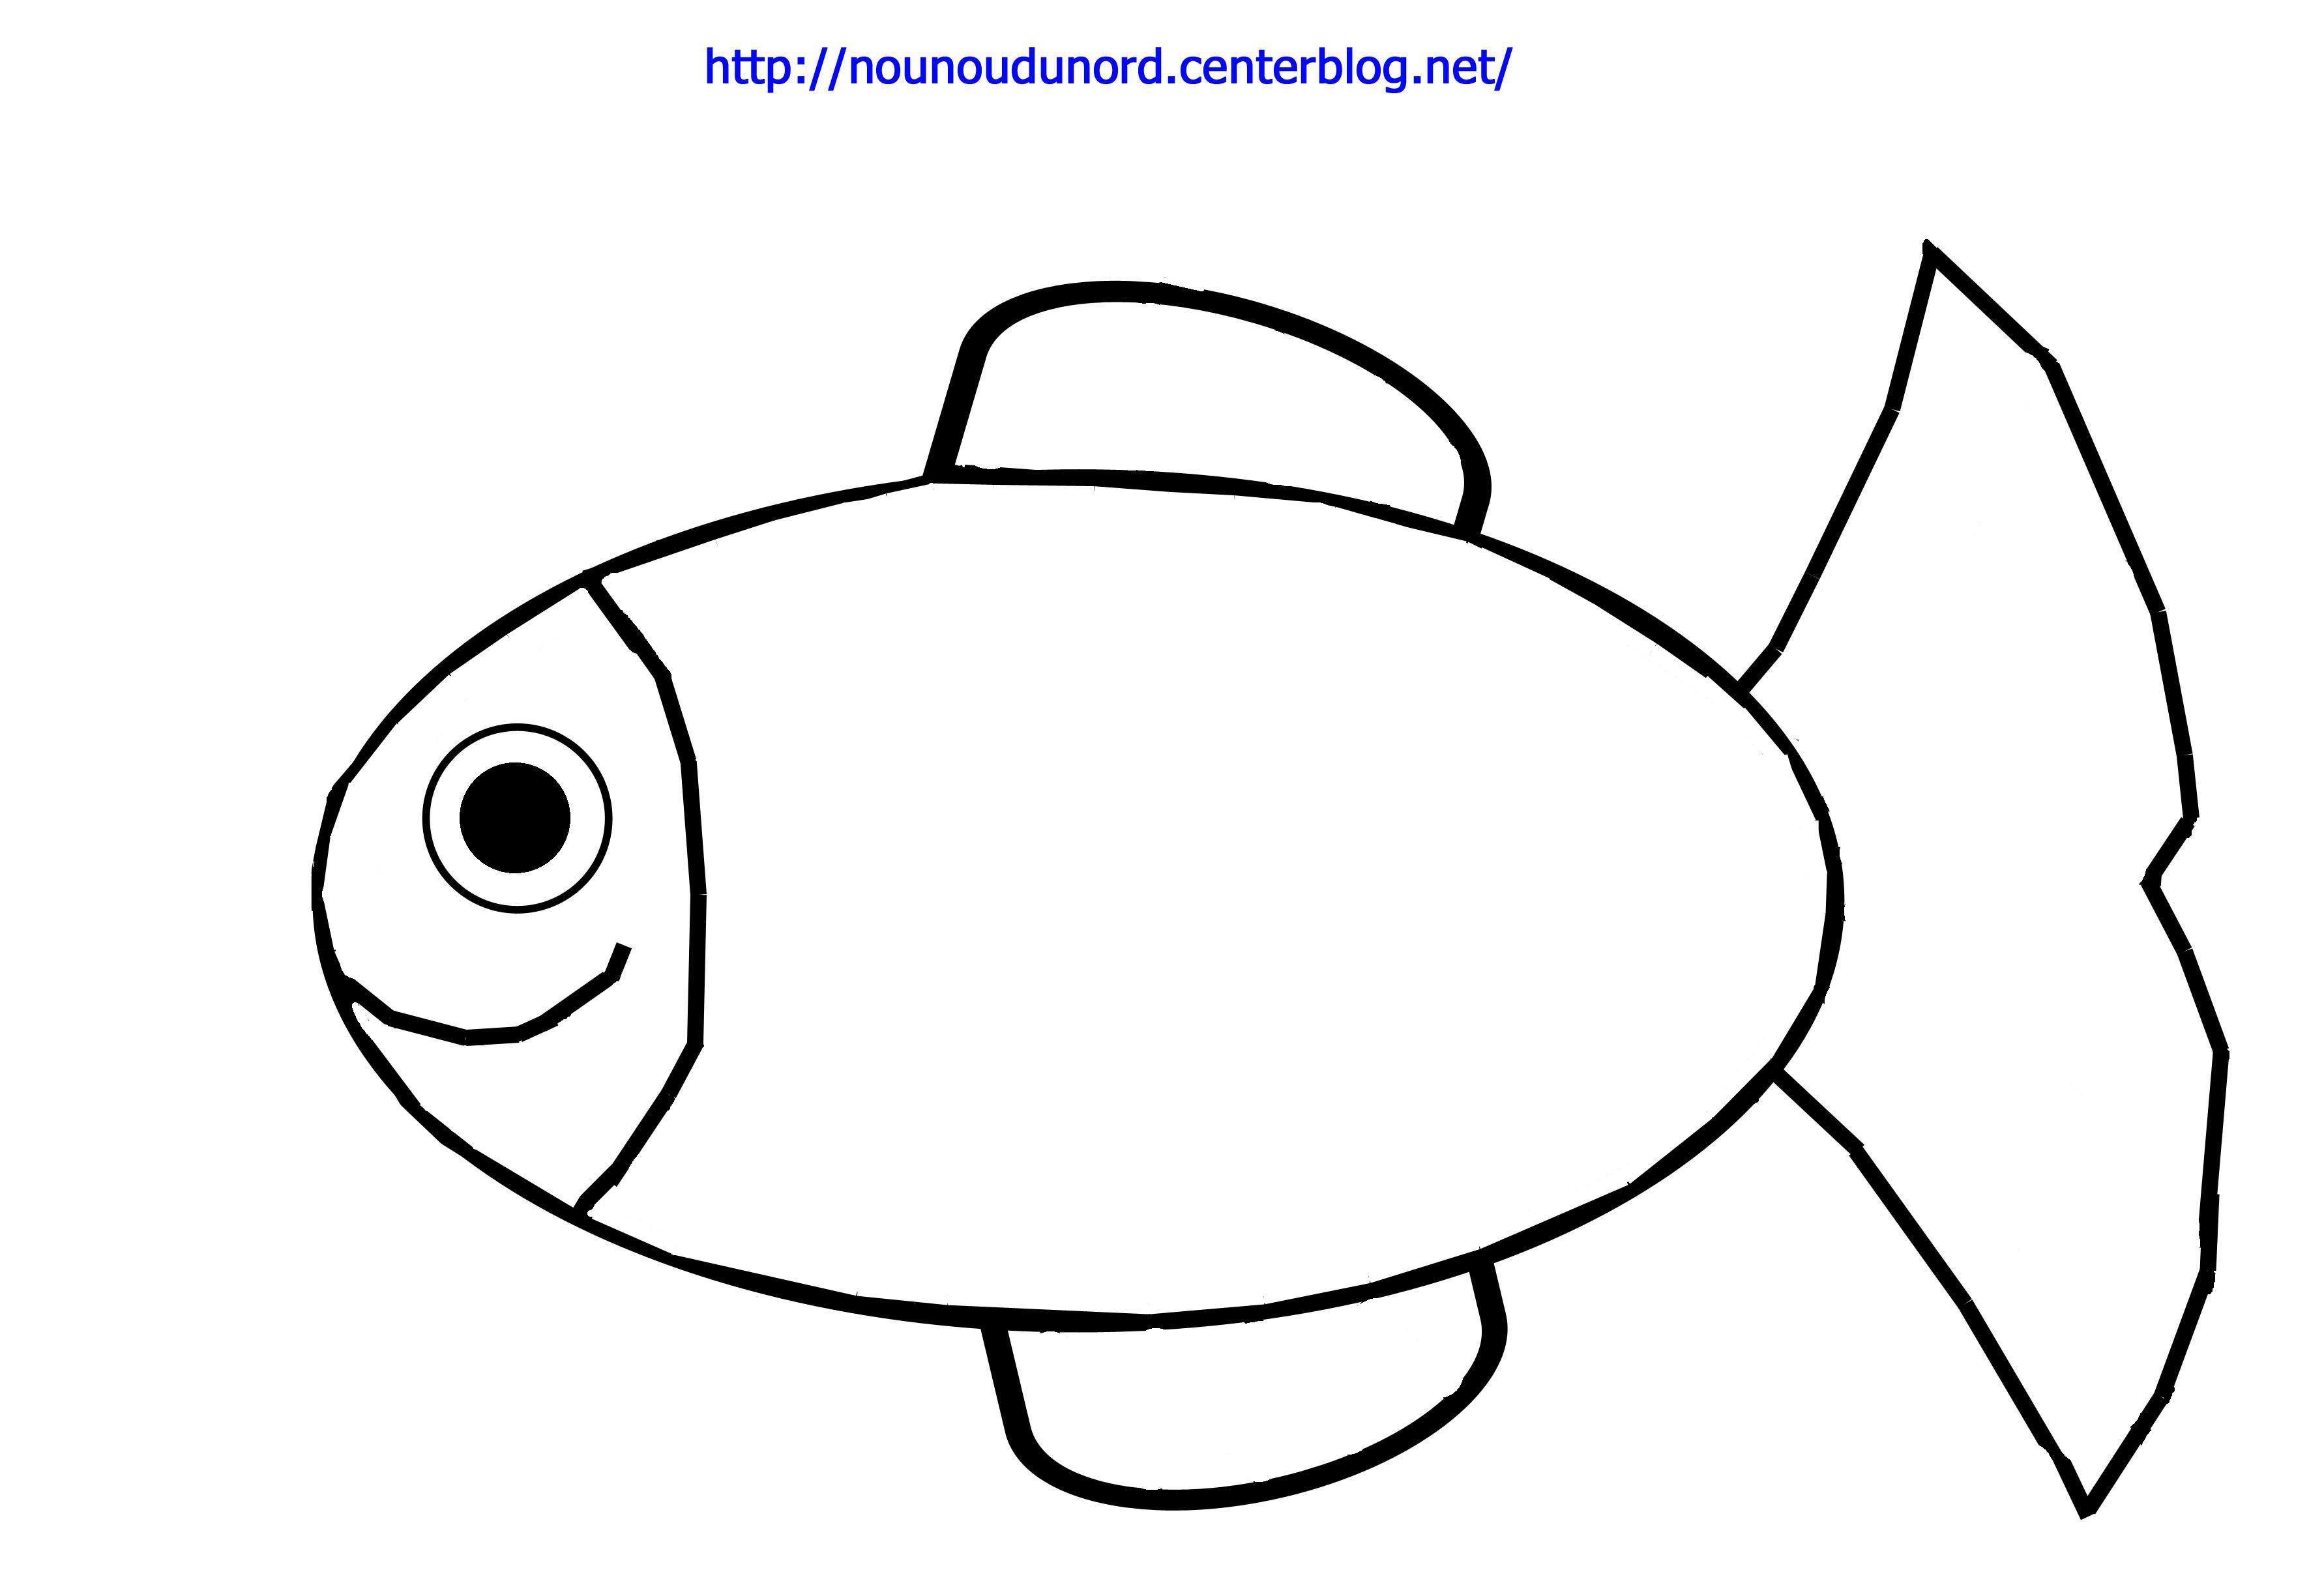 Coloriage poisson dessin par nounoudunord - Dessin poisson facile ...